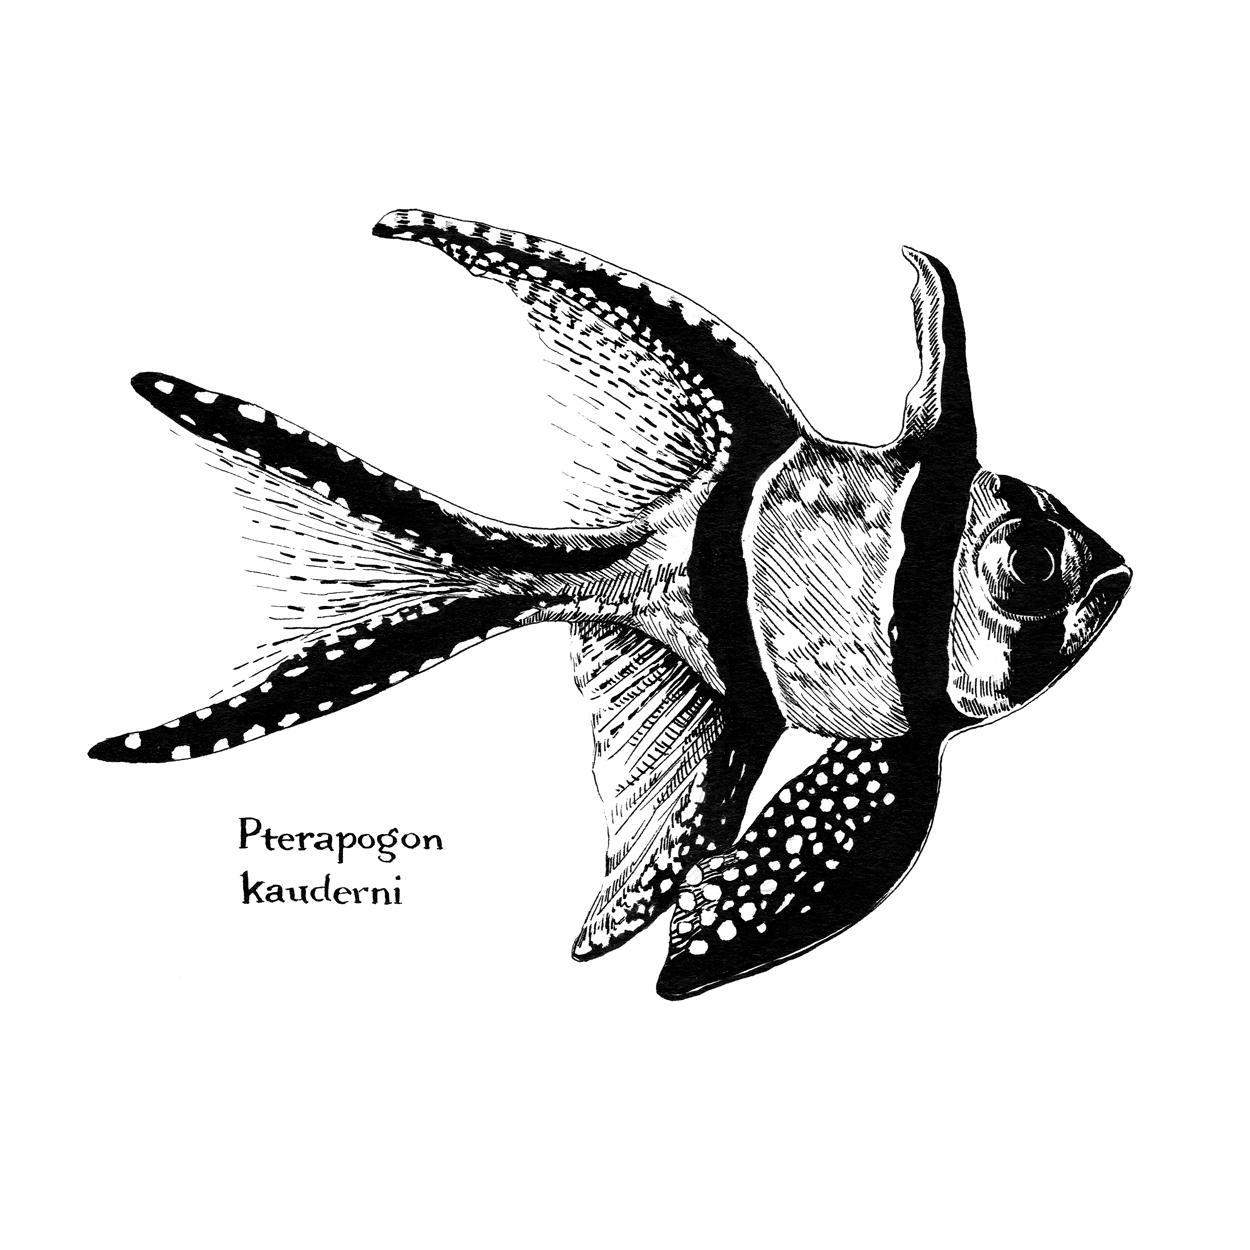 Pterapogon-kauderni_Fish.jpg